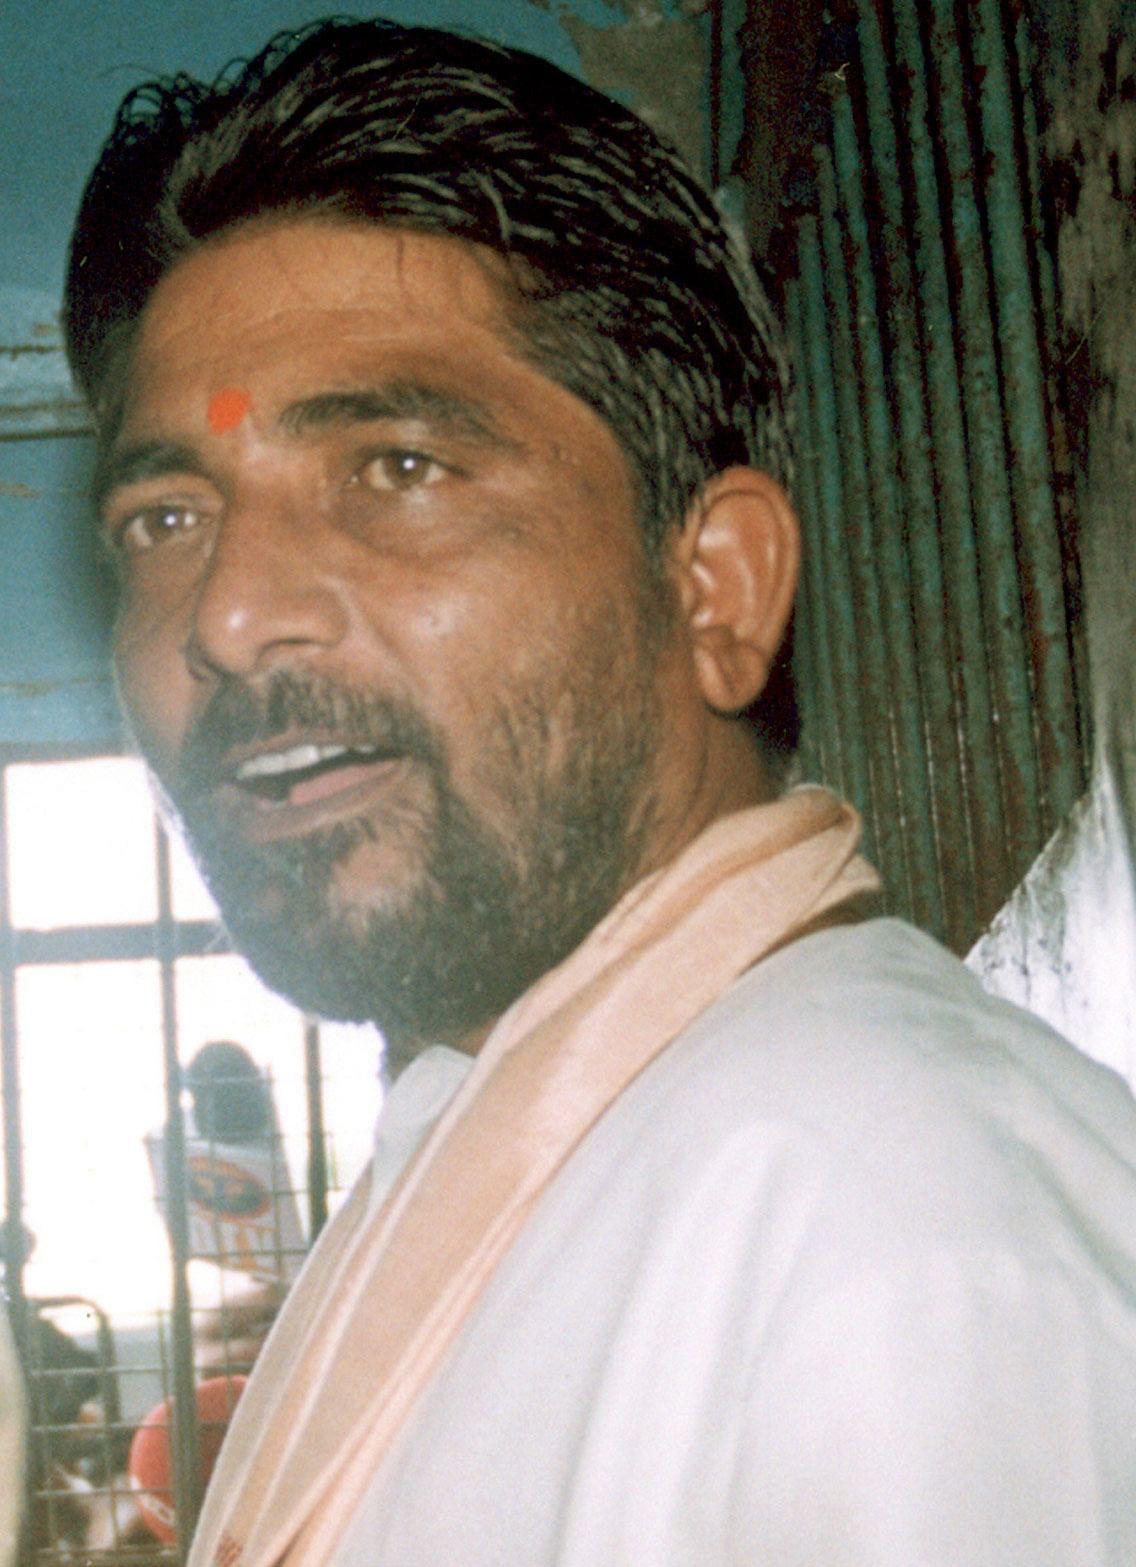 Hindu activist and ringleader Dara Singh is seated in a police van in Bhubaneswar.